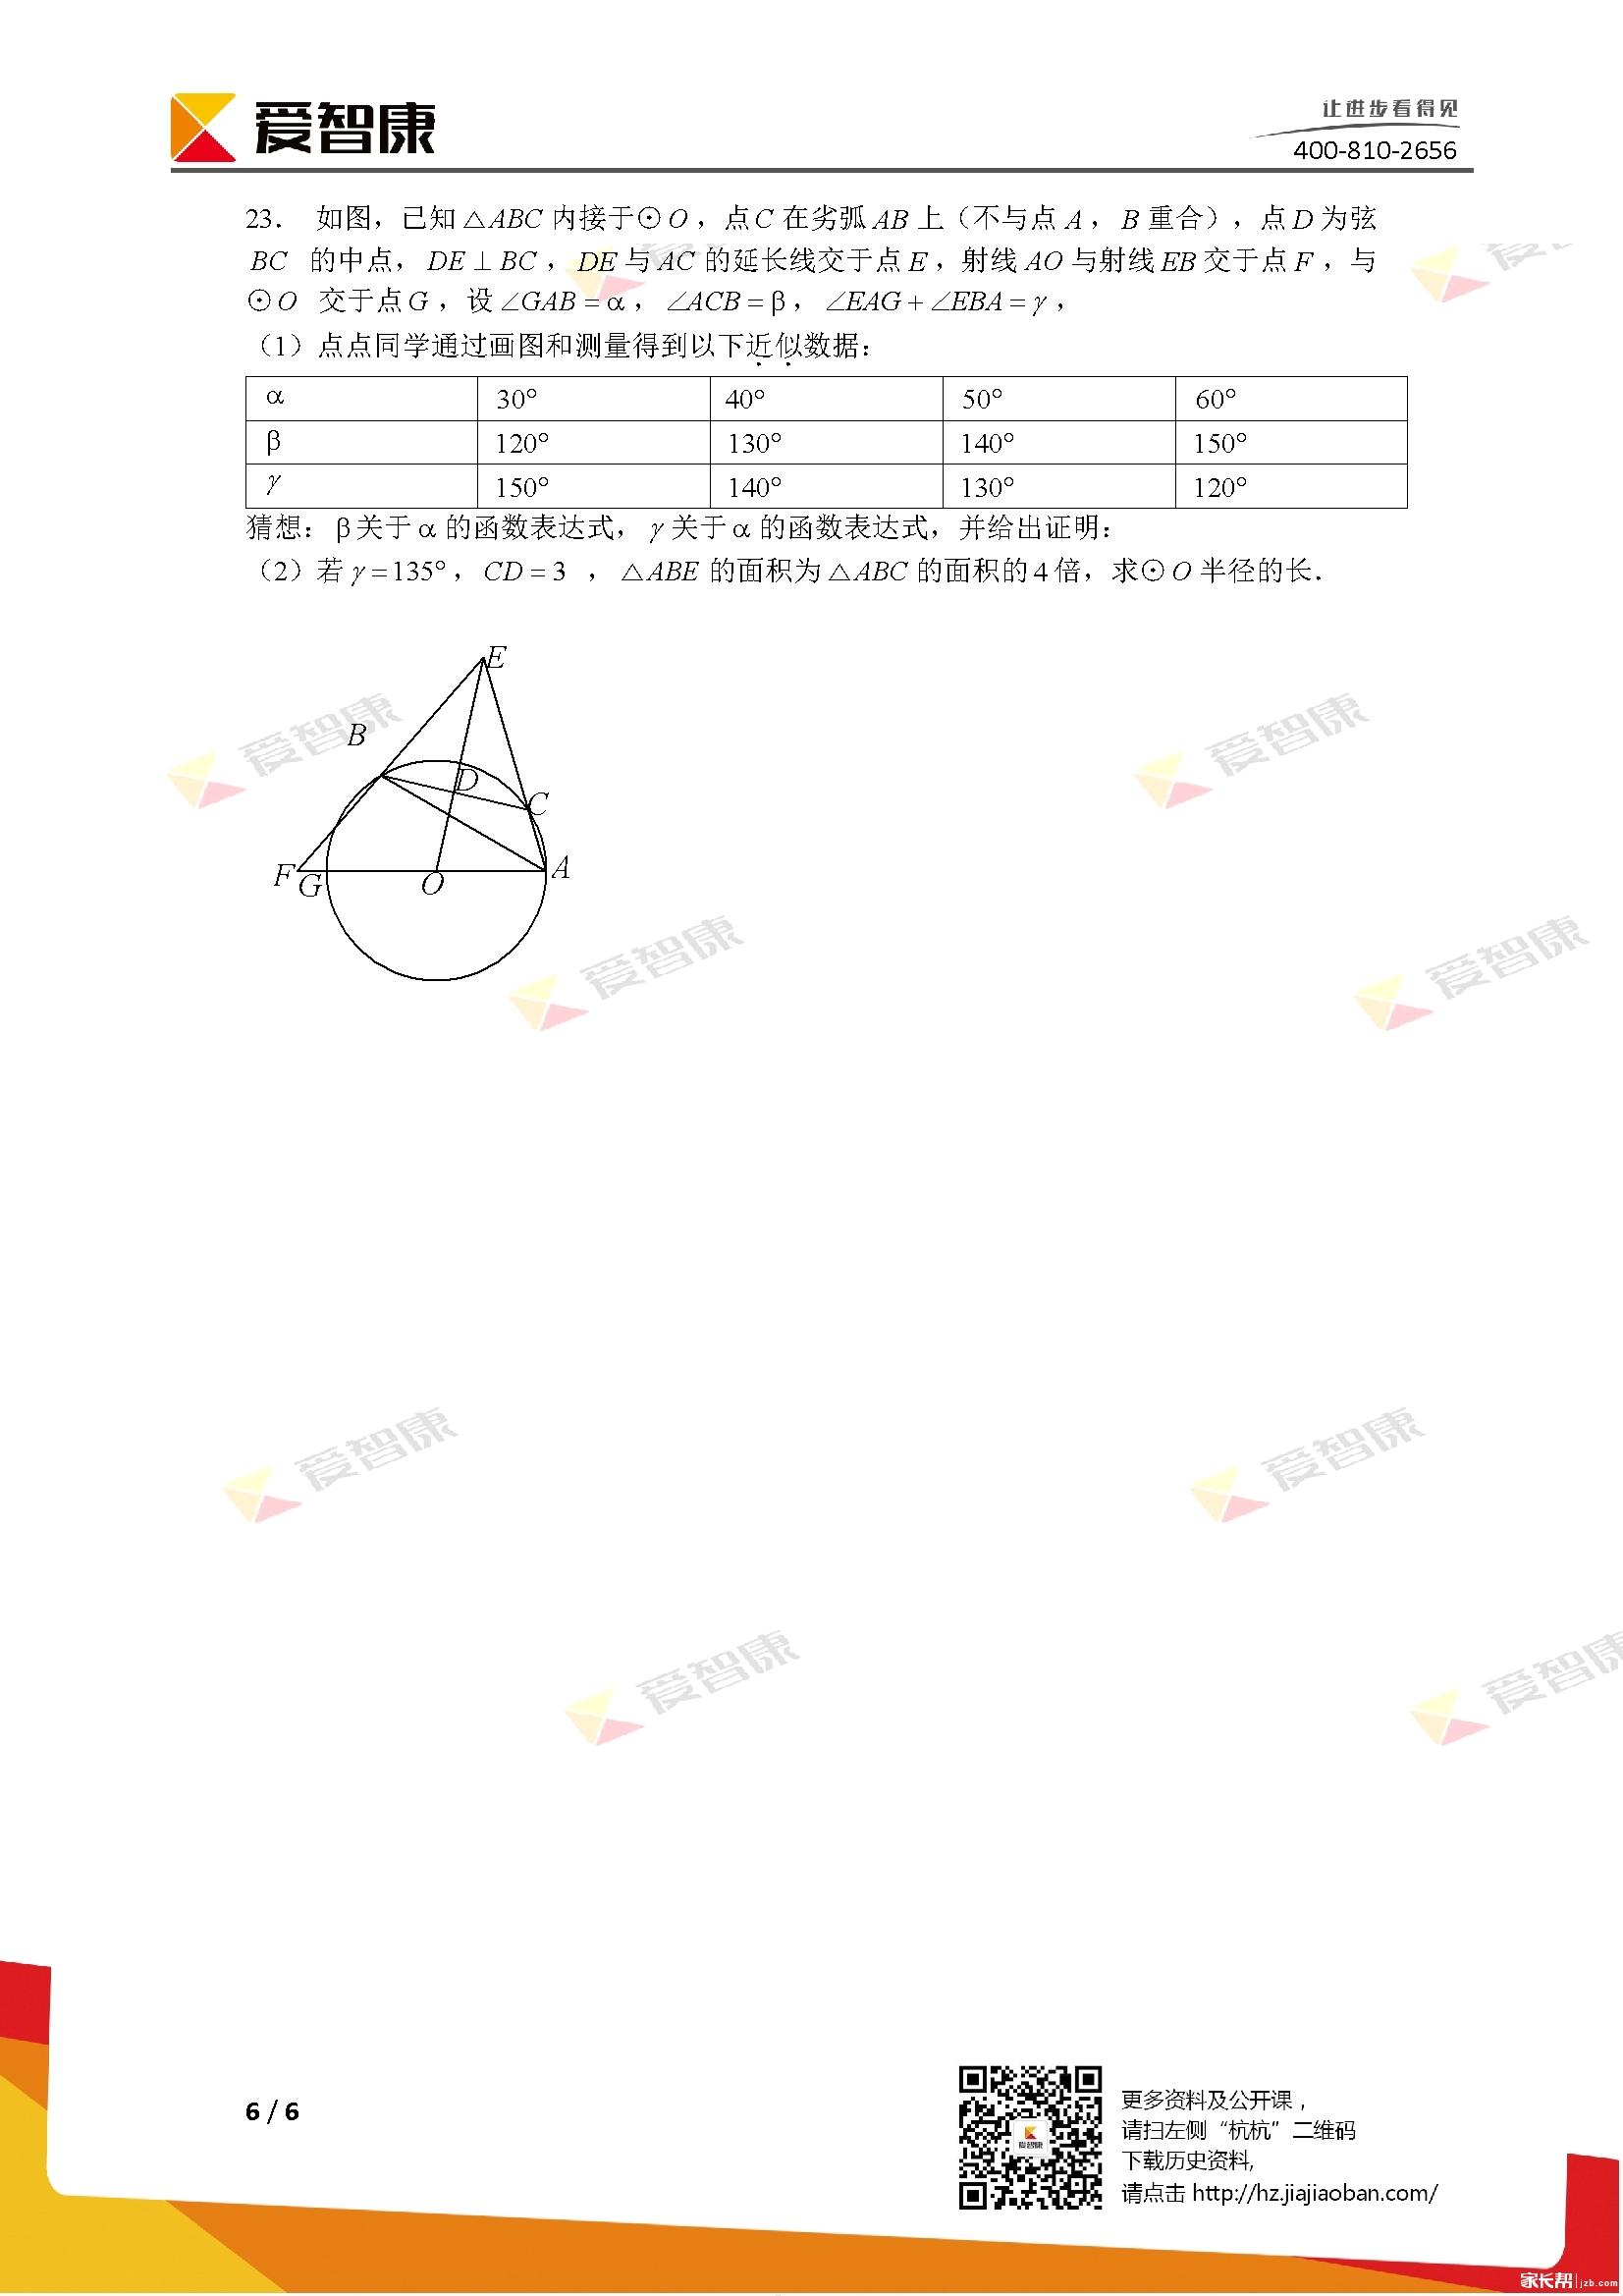 Microsoft Word - 2017年杭州市中考数学试卷26.jpg